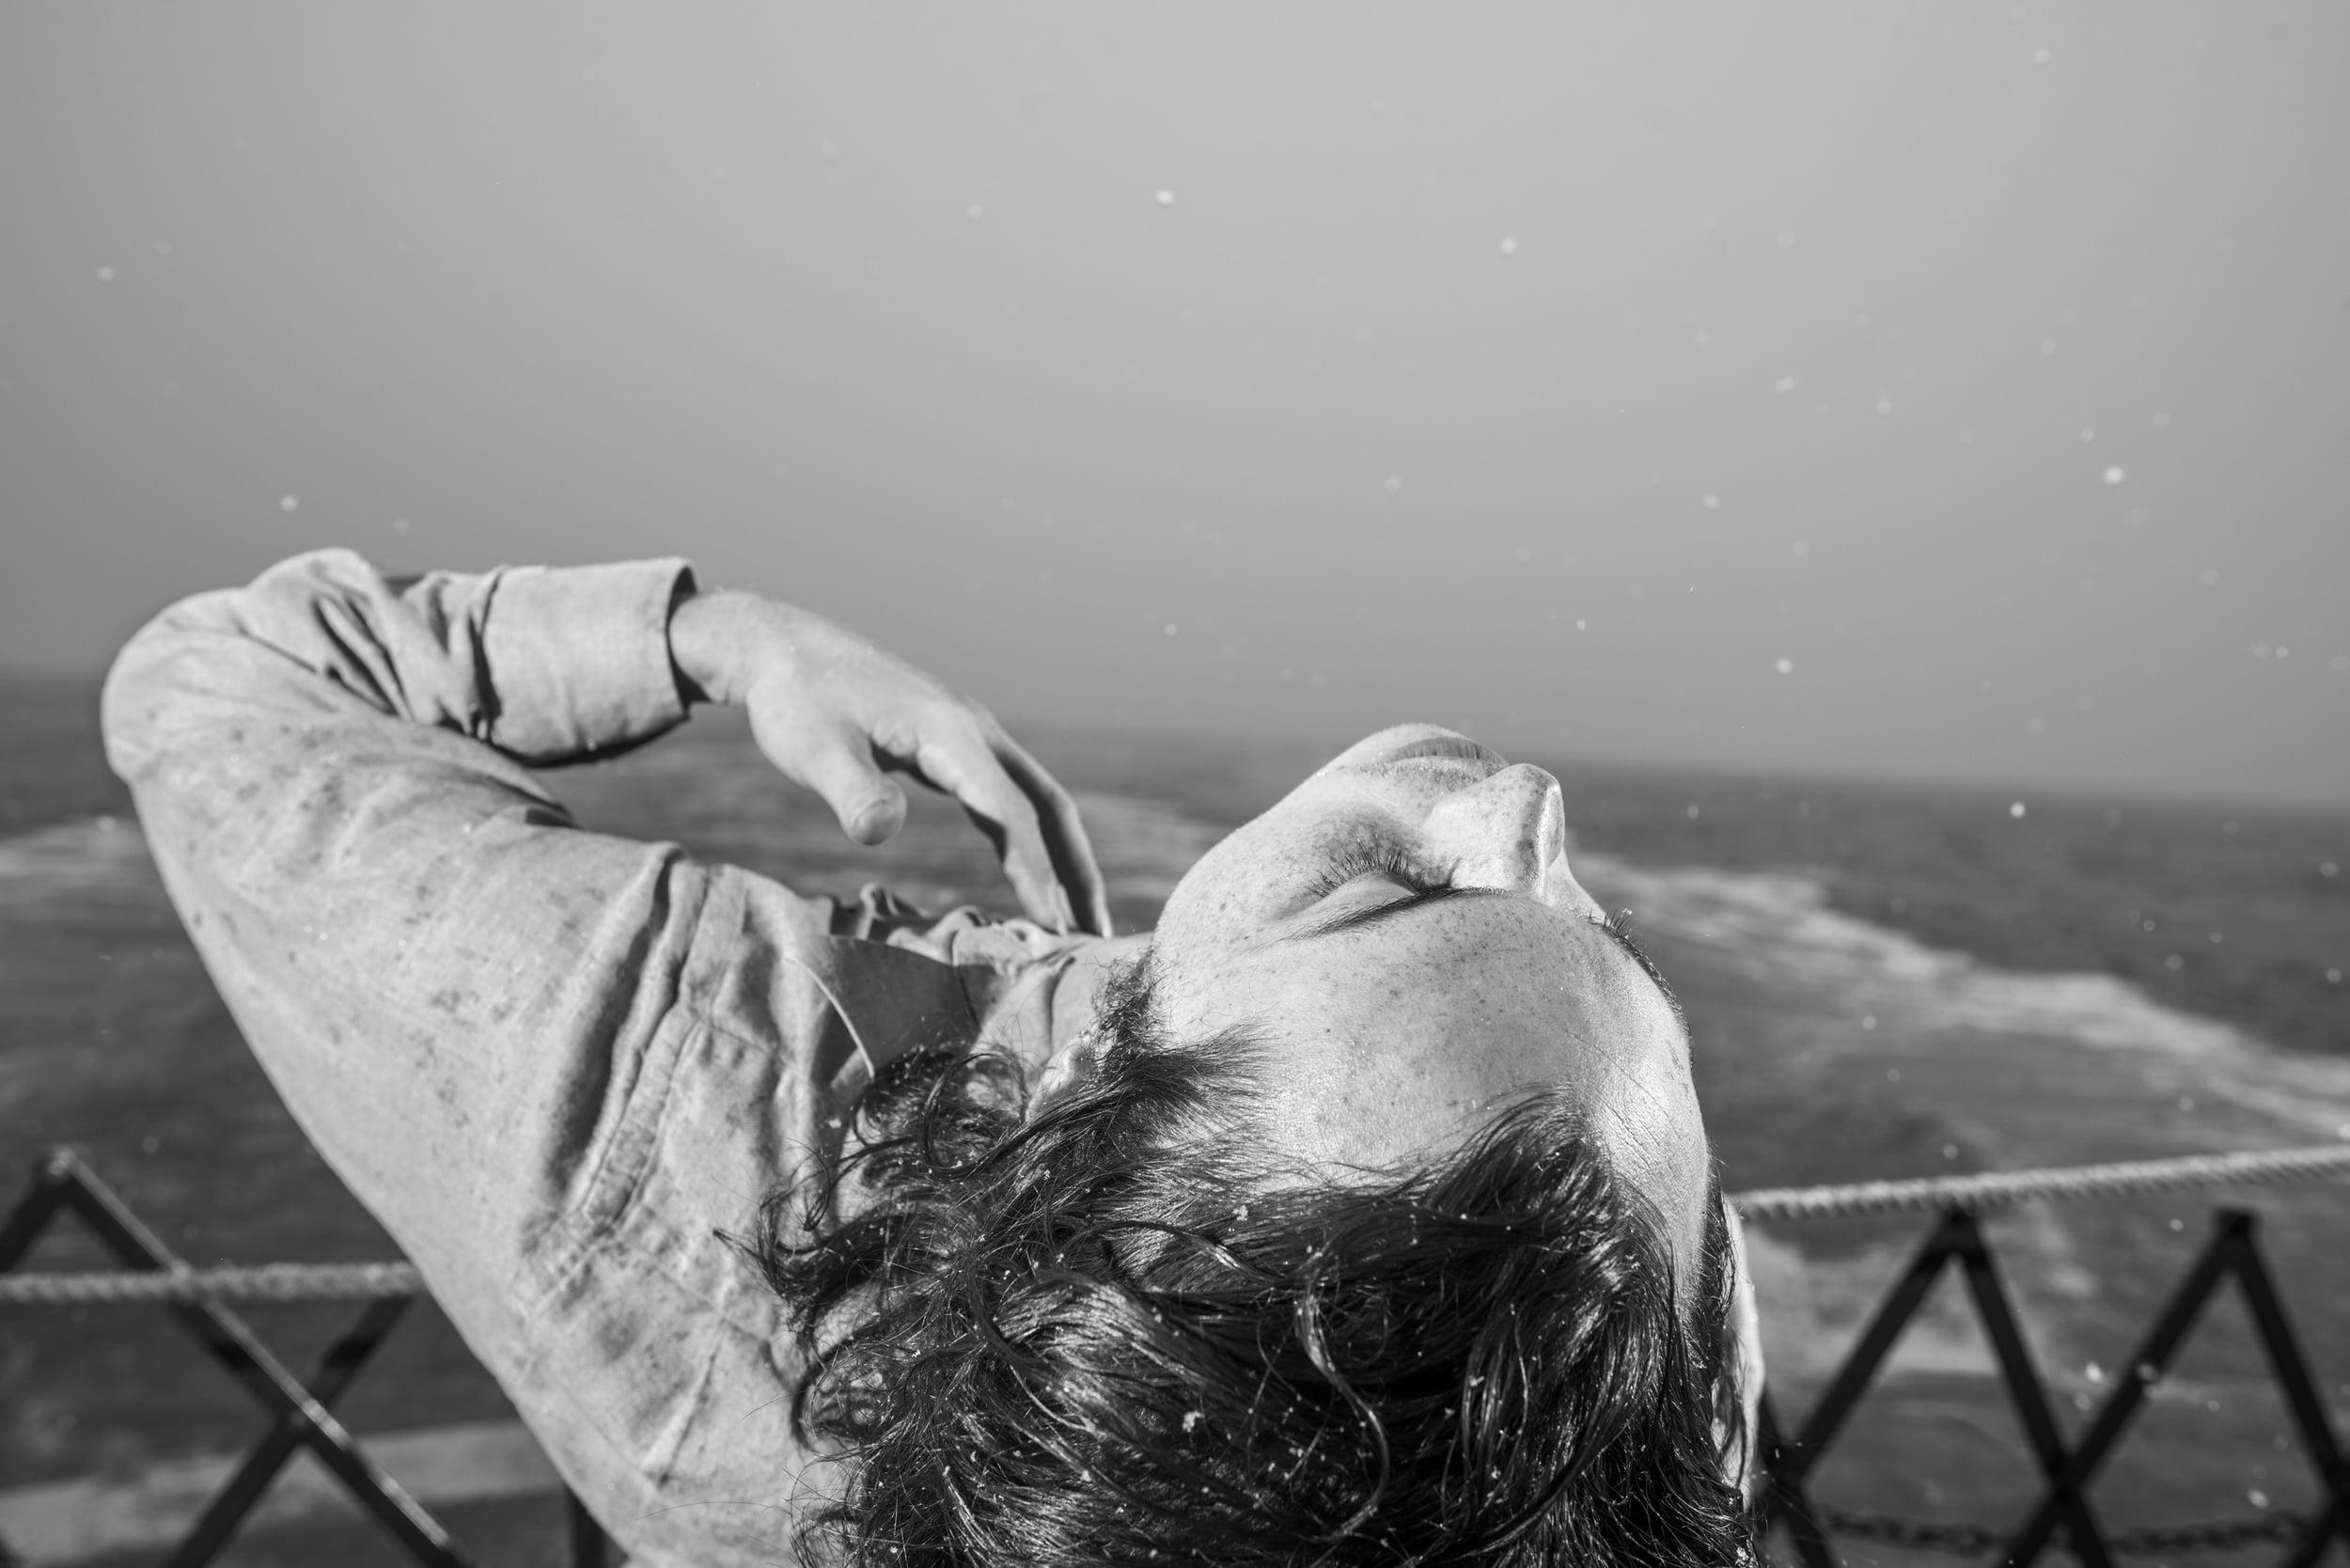 How you shone through me  Photograph by Jonno Rattman